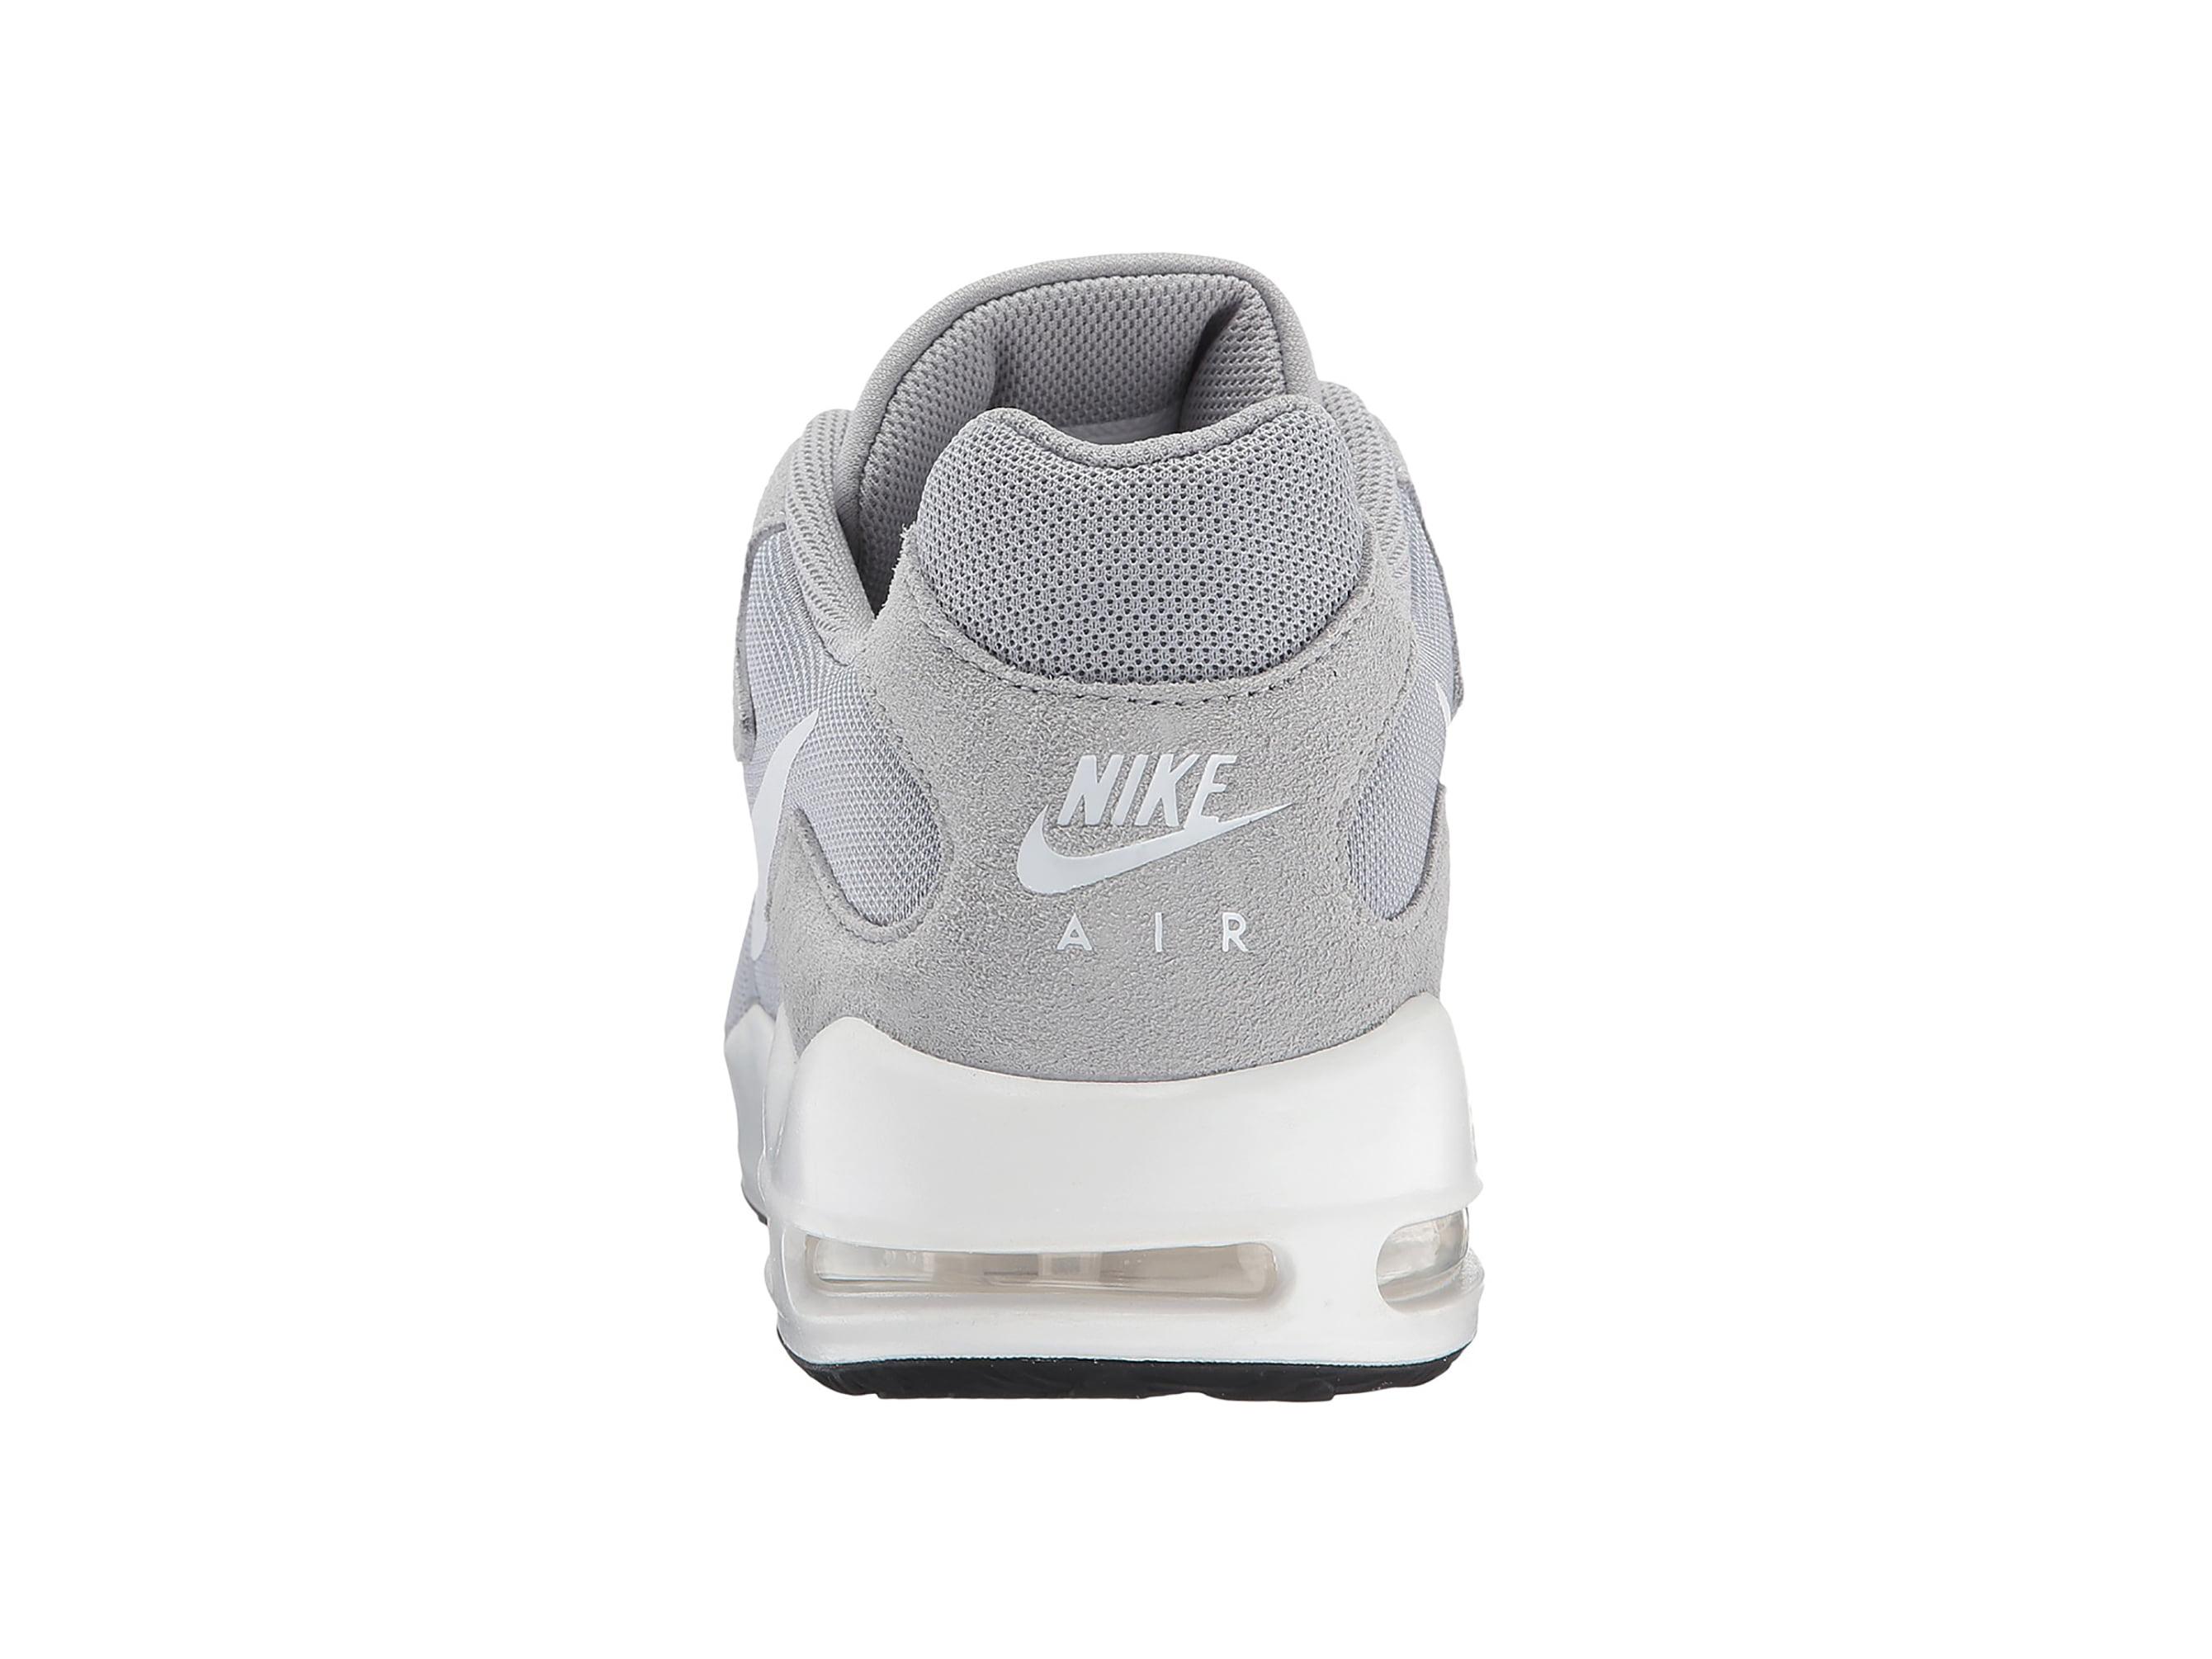 6857b8e51c Nike - Nike Men's Air Max Guile Running Shoe, Wolf Grey/White 10.5 -  Walmart.com